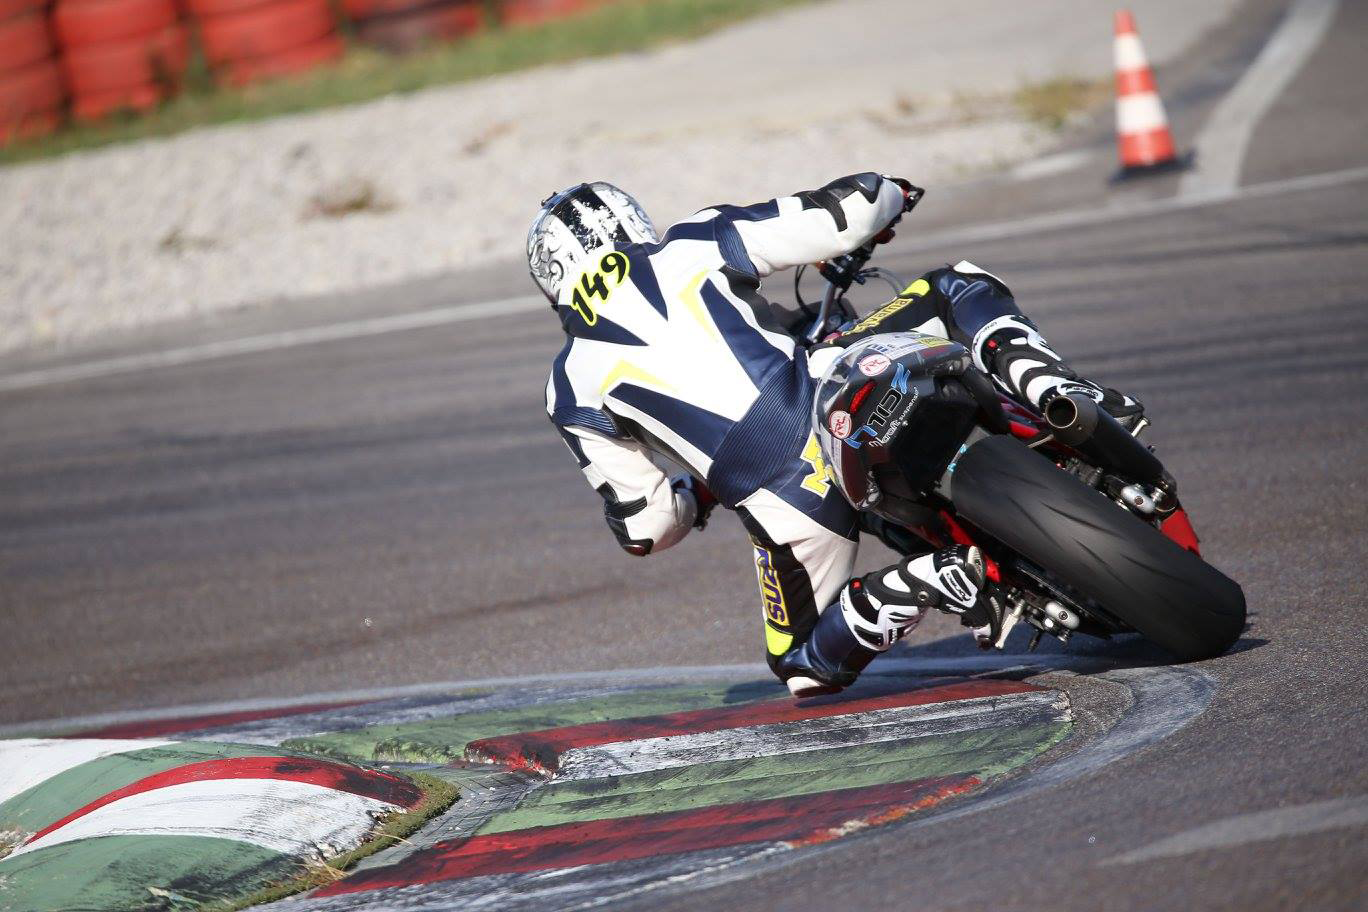 motoclub-egna-slide3